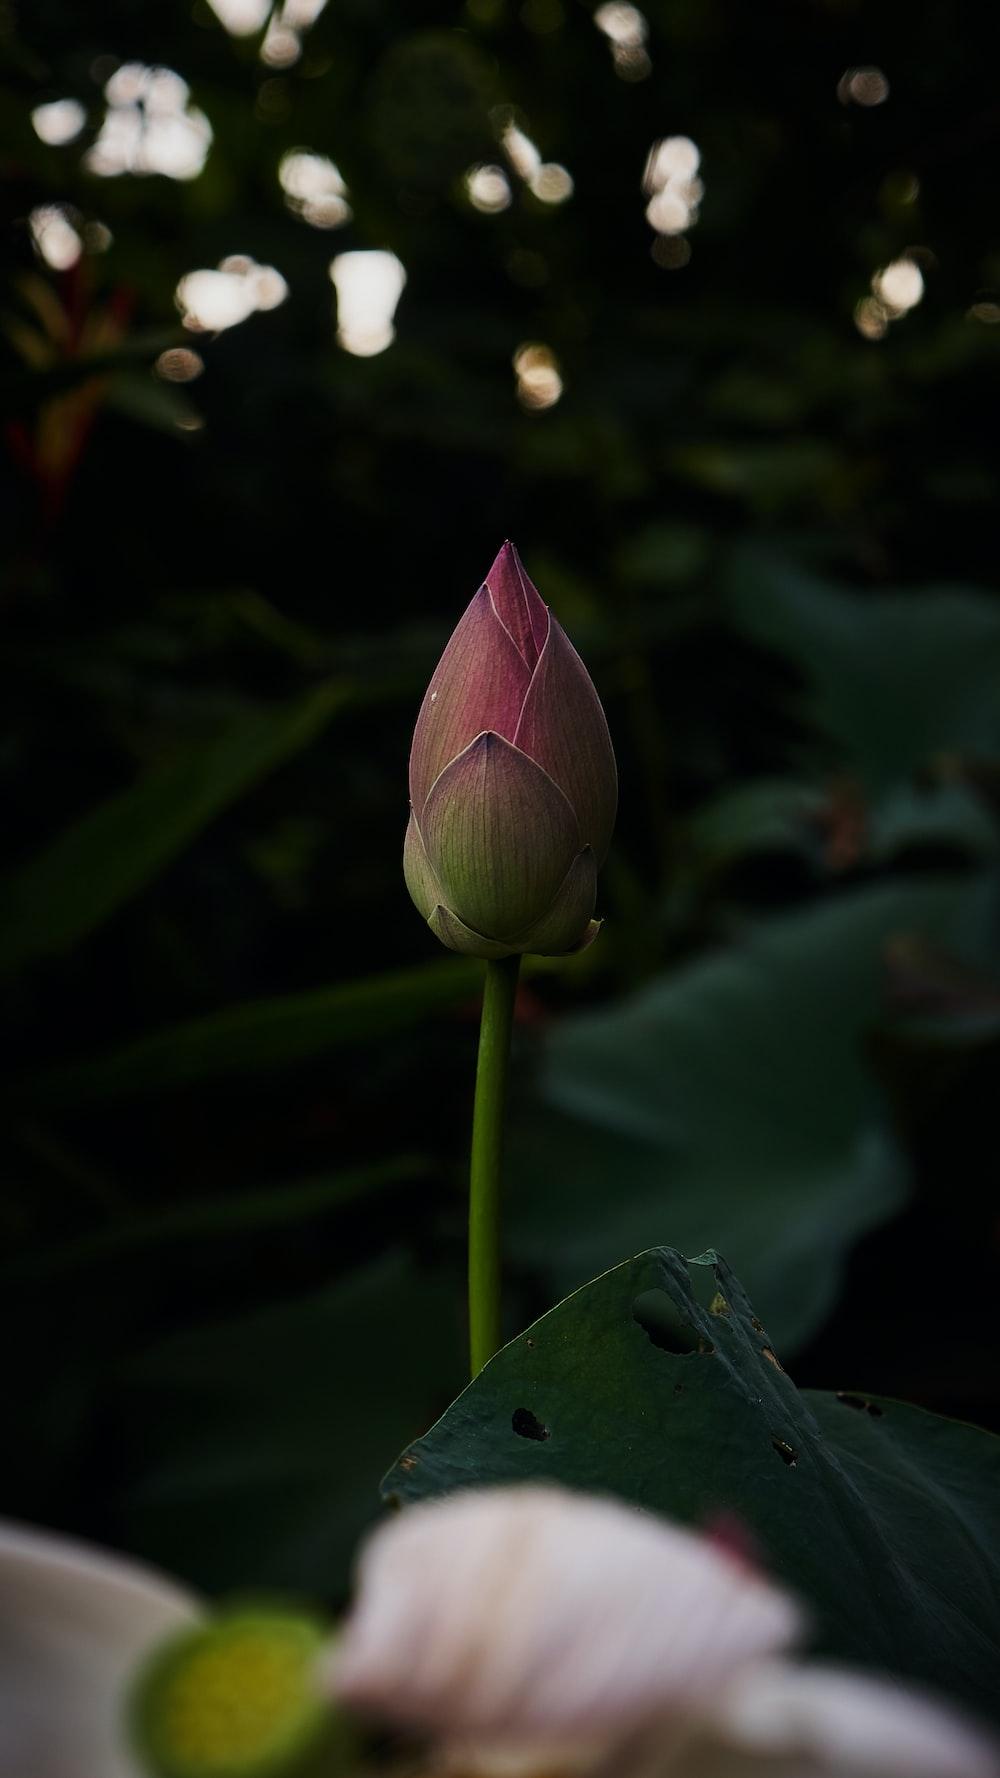 bud of pink flower